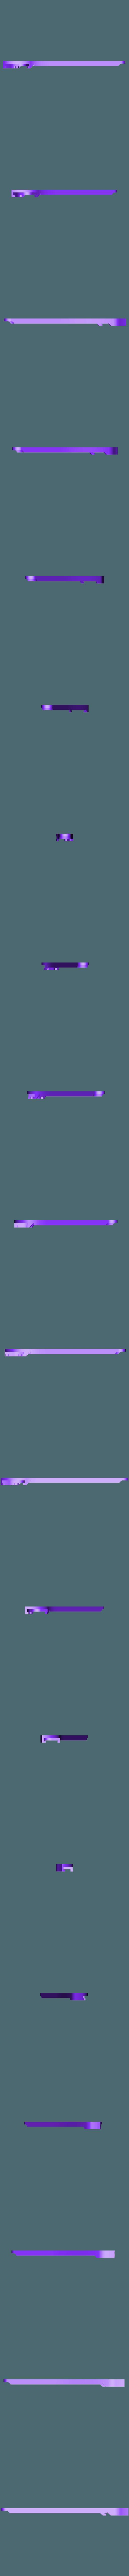 Base.stl Télécharger fichier STL gratuit Support universel de caméra Ender 3 Bed • Objet à imprimer en 3D, Kliffom